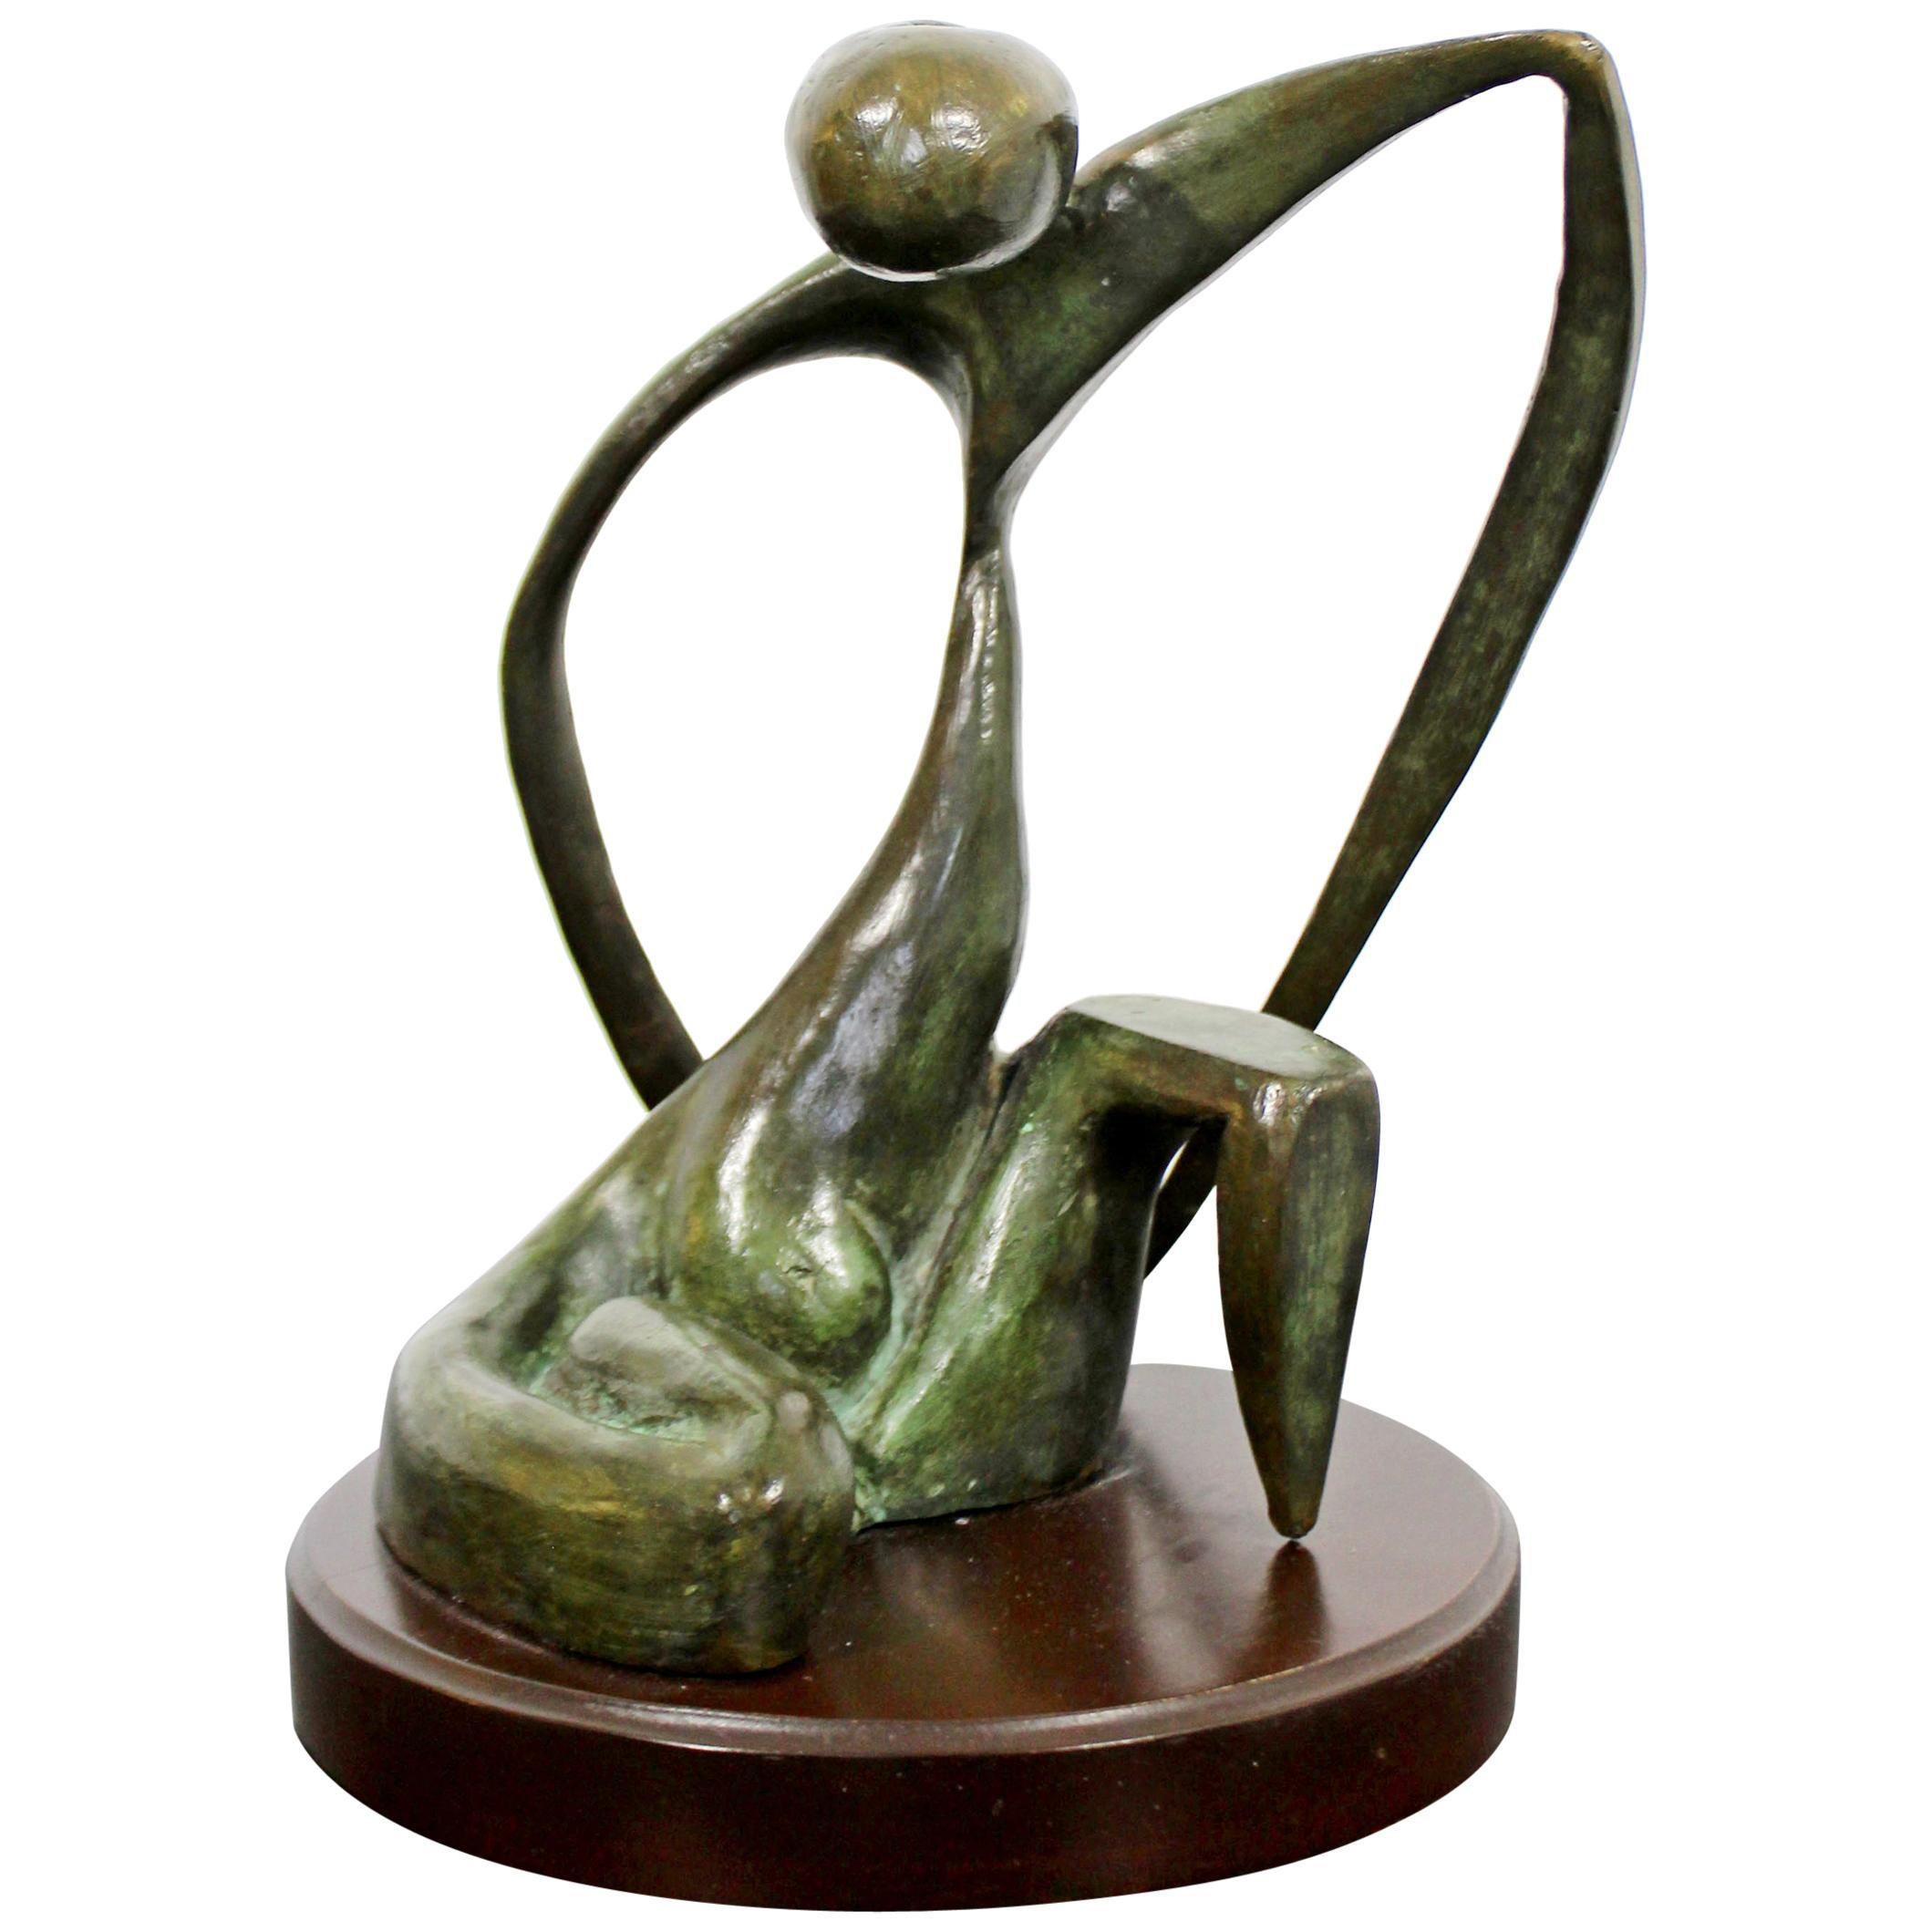 Mid-Century Modern Bronze Table Sculpture Signed Porret Belle Inconnue 1/5 1970s